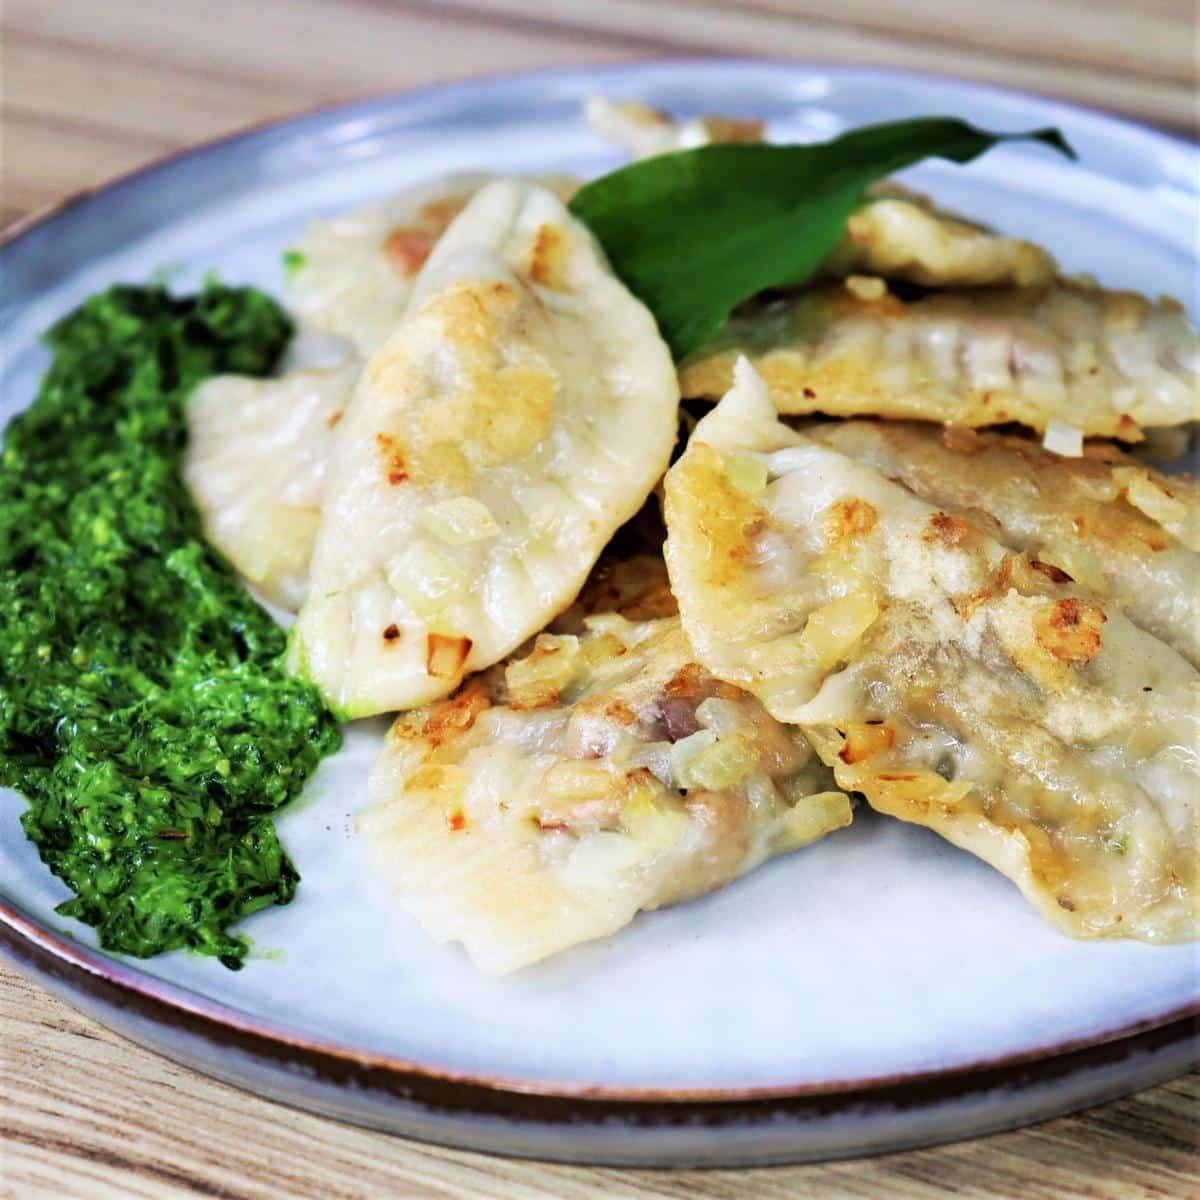 style hannover olze kocht 4.jpg - Olze kocht online – Zuhause kochen, zusammen genießen